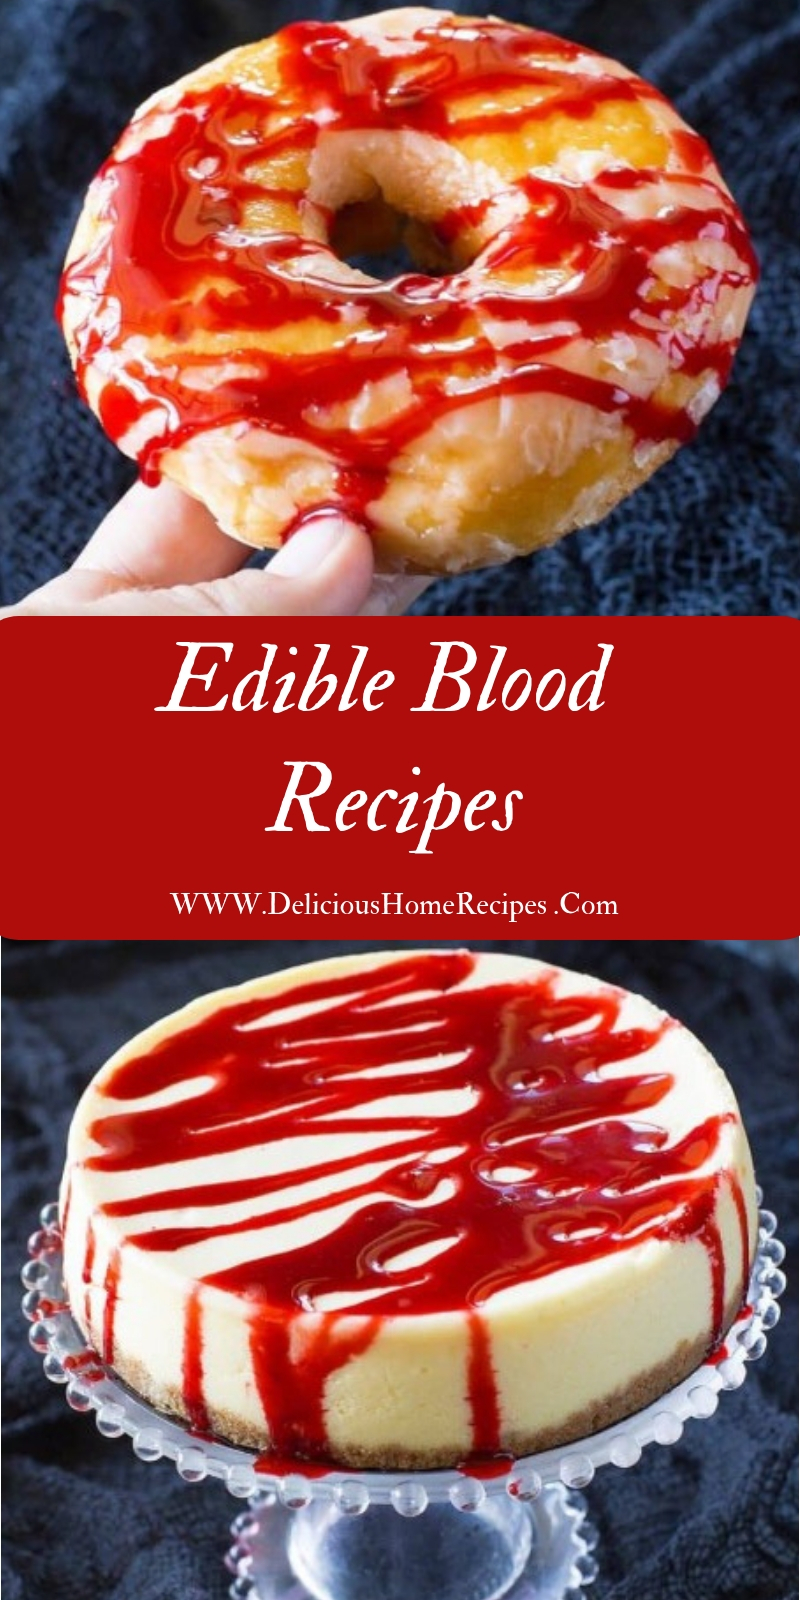 Edible Blood Recipes #christmas #dessert